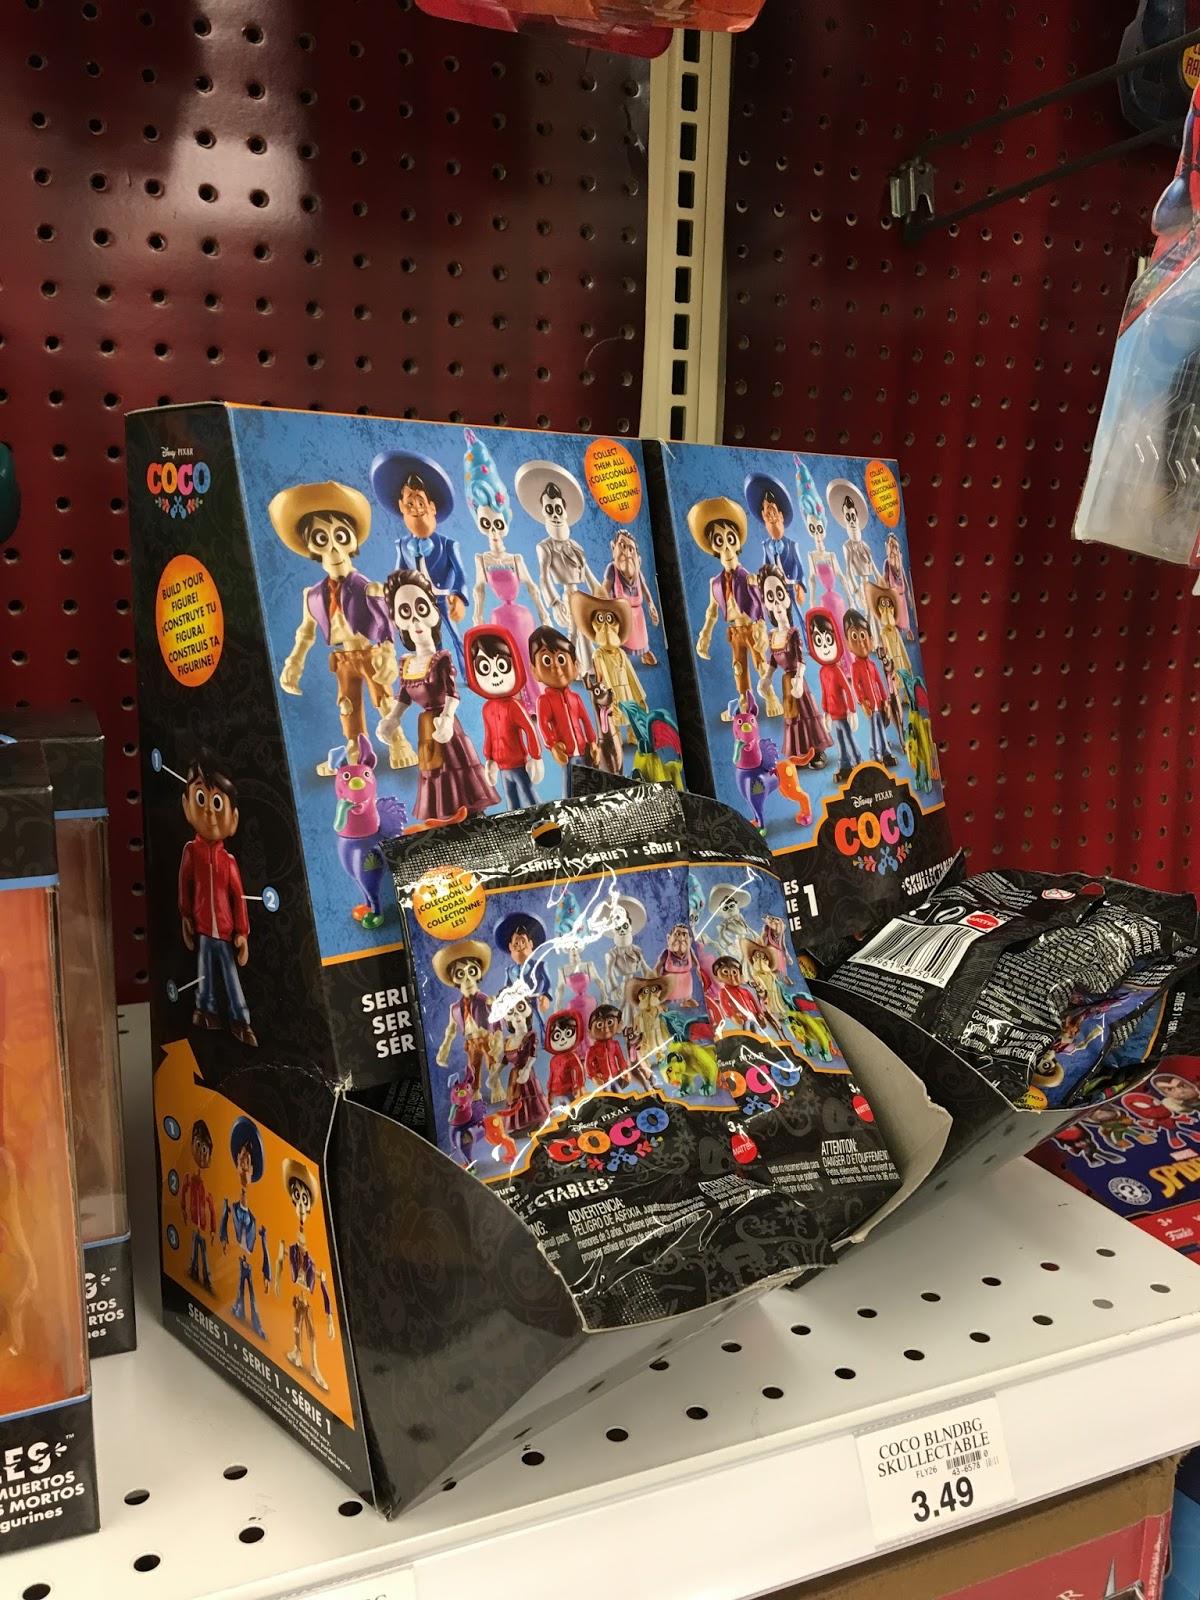 pixar coco toys in store